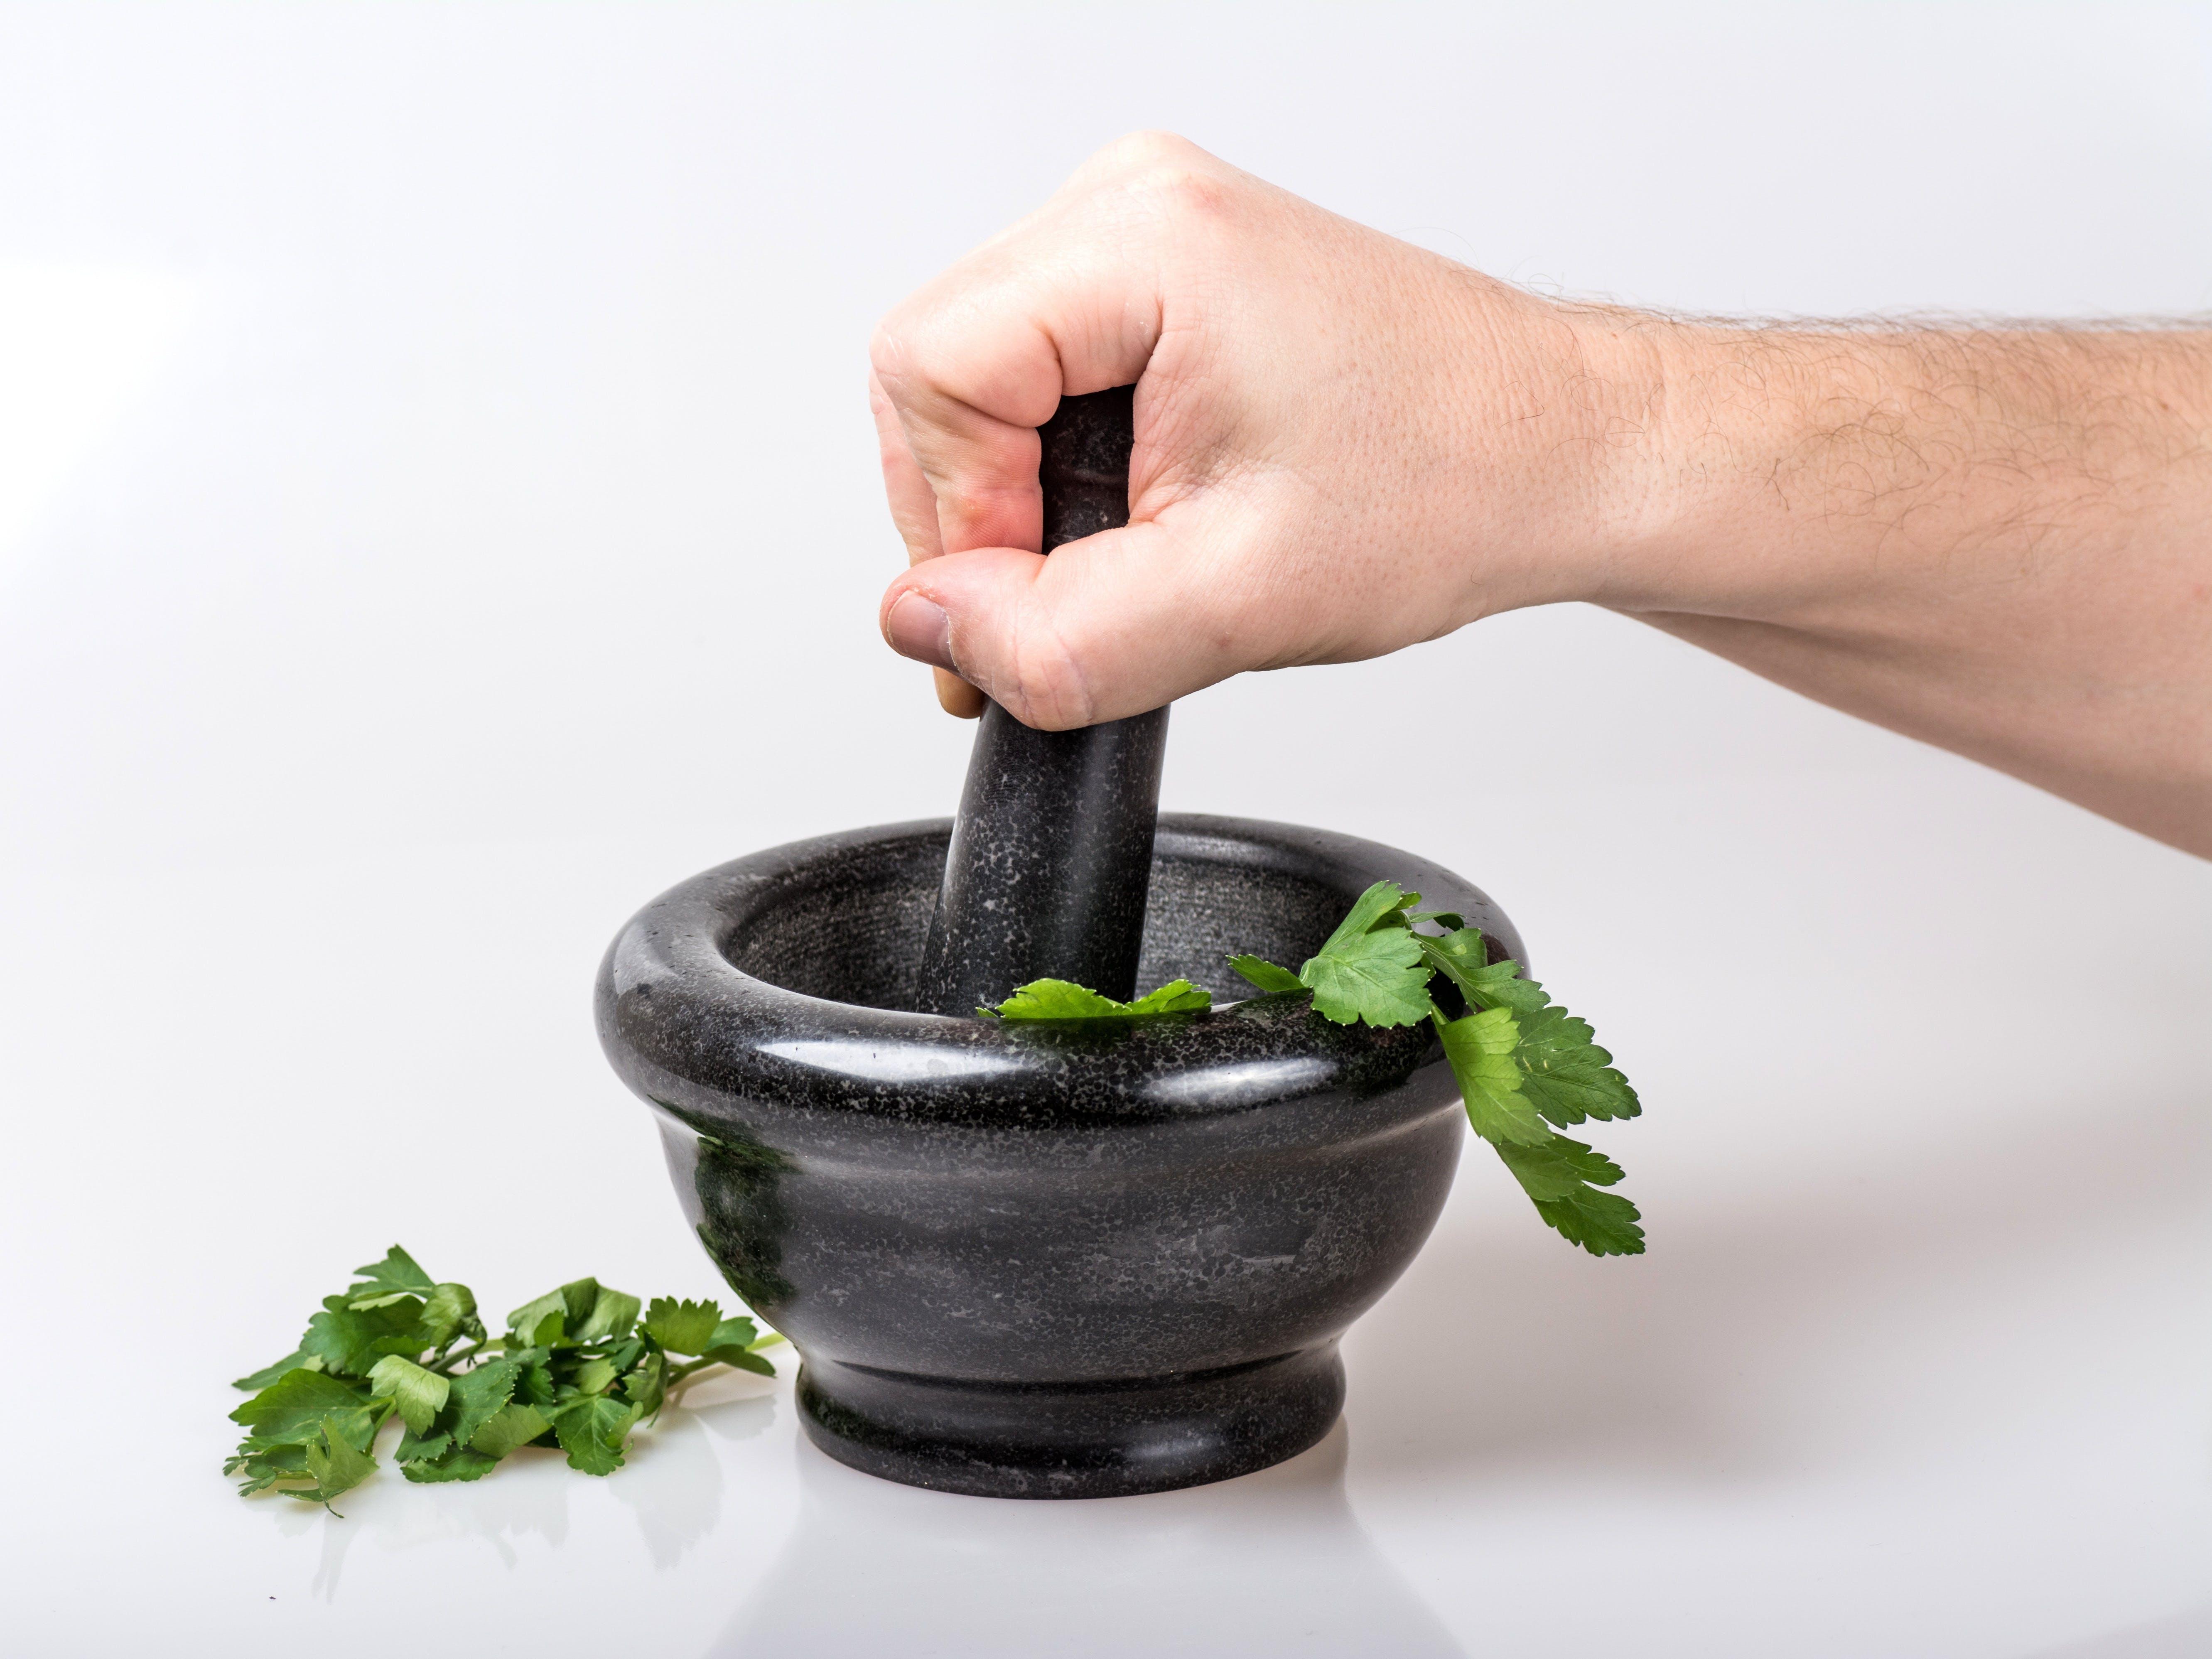 Human Holding Black Ceramic Pestle